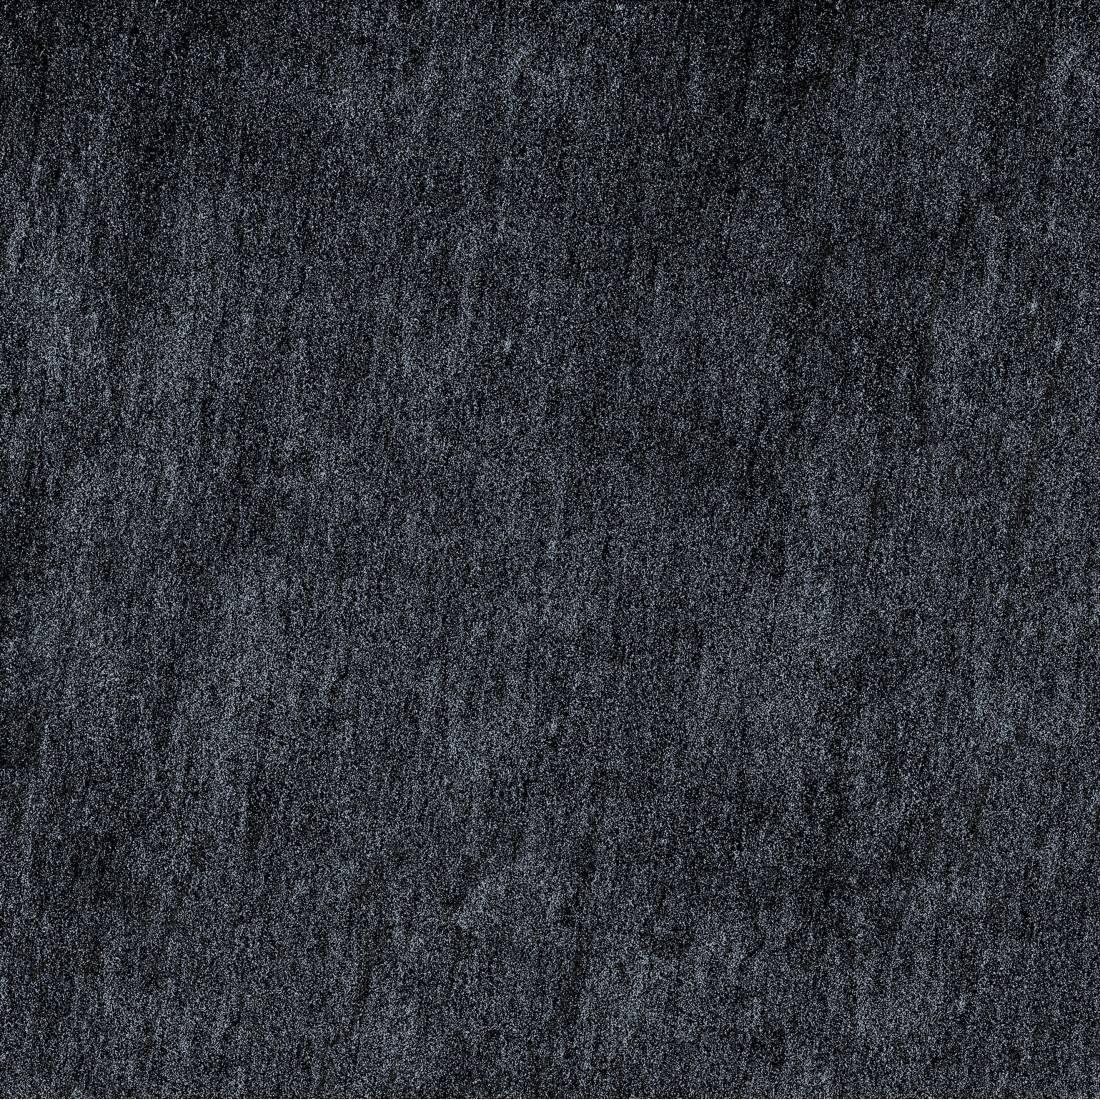 Paver Ardesia 60x60x2 Black Matt R11 1